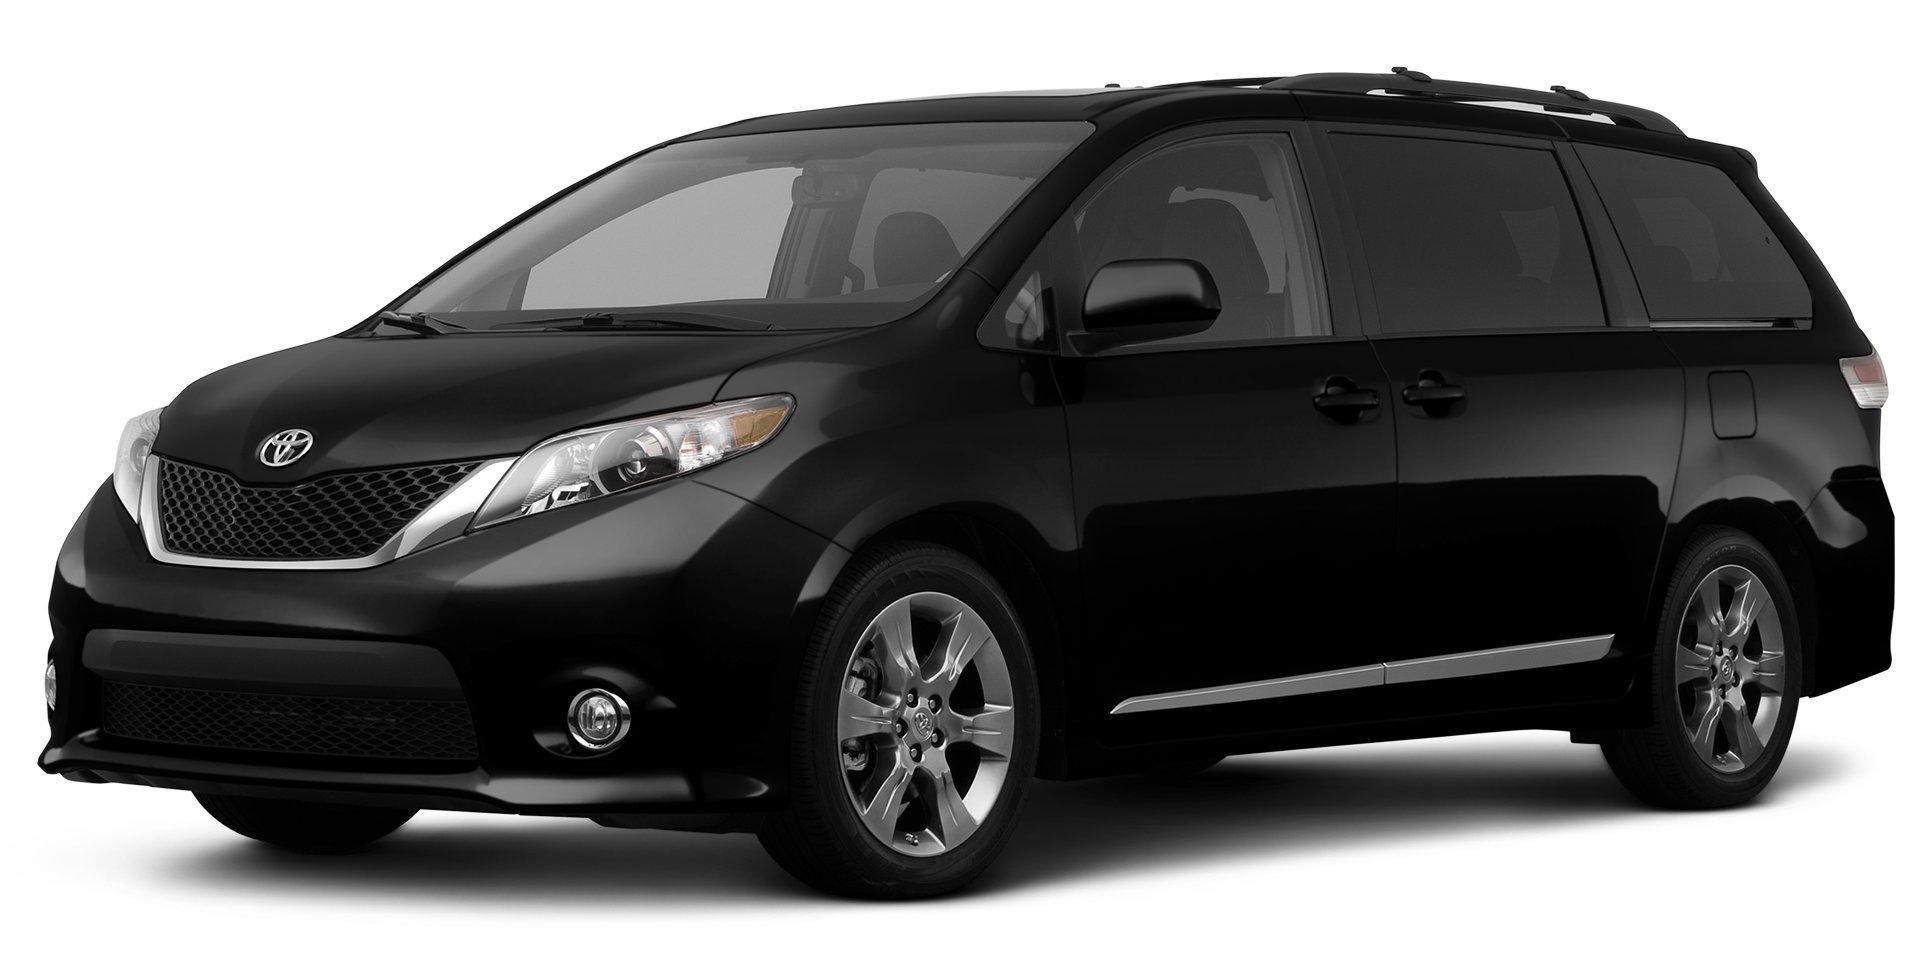 Amazon.com: 2012 Nissan Quest Reviews, Images, and Specs ...